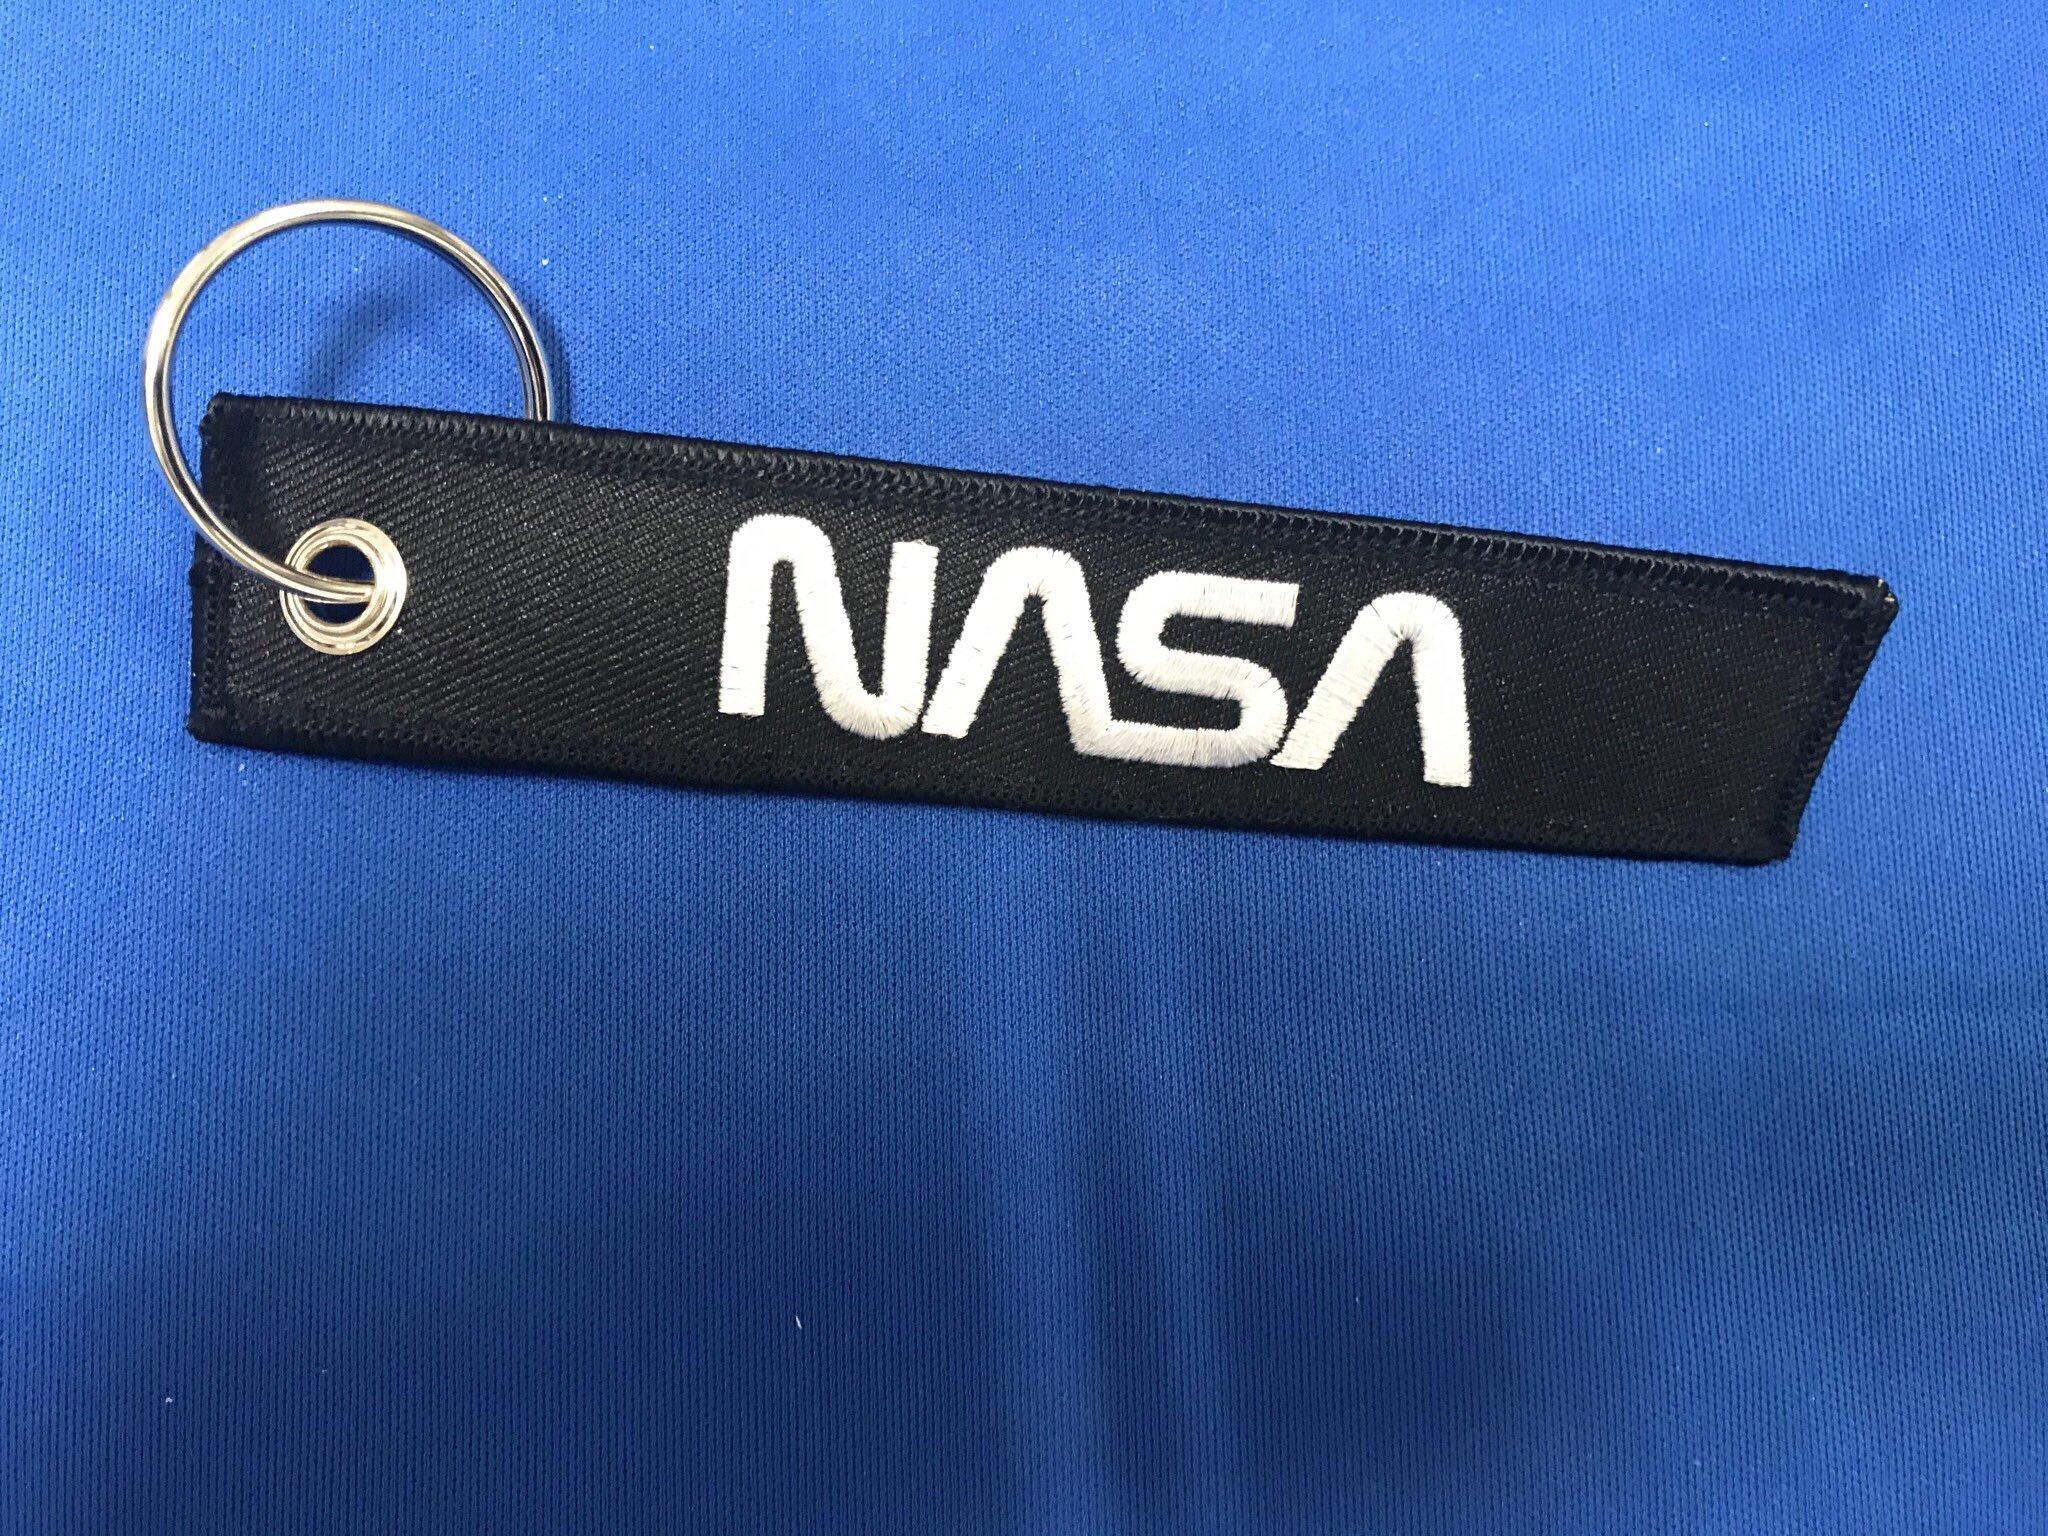 RemoveBeforeLaunchキーホルダー NASA